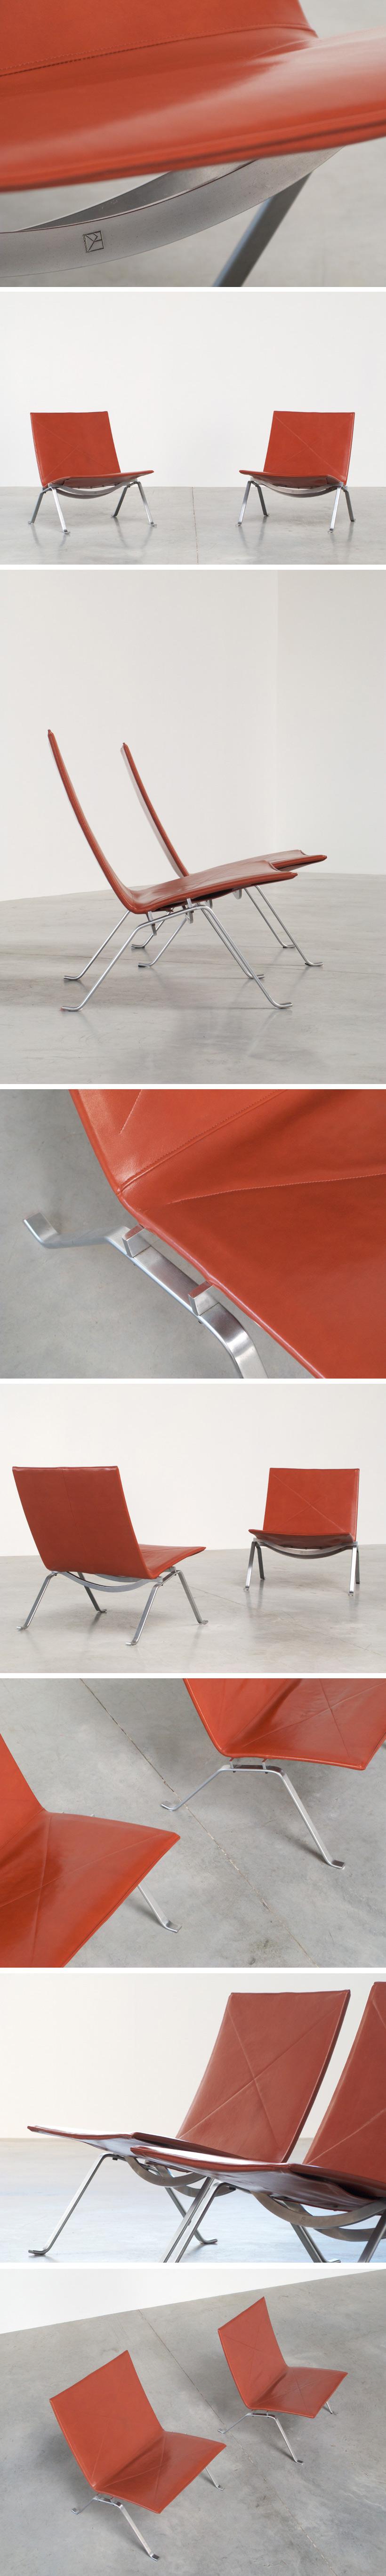 Poul Kjaerholm pair PK 22 lounge chairs E Kold Christensen Large